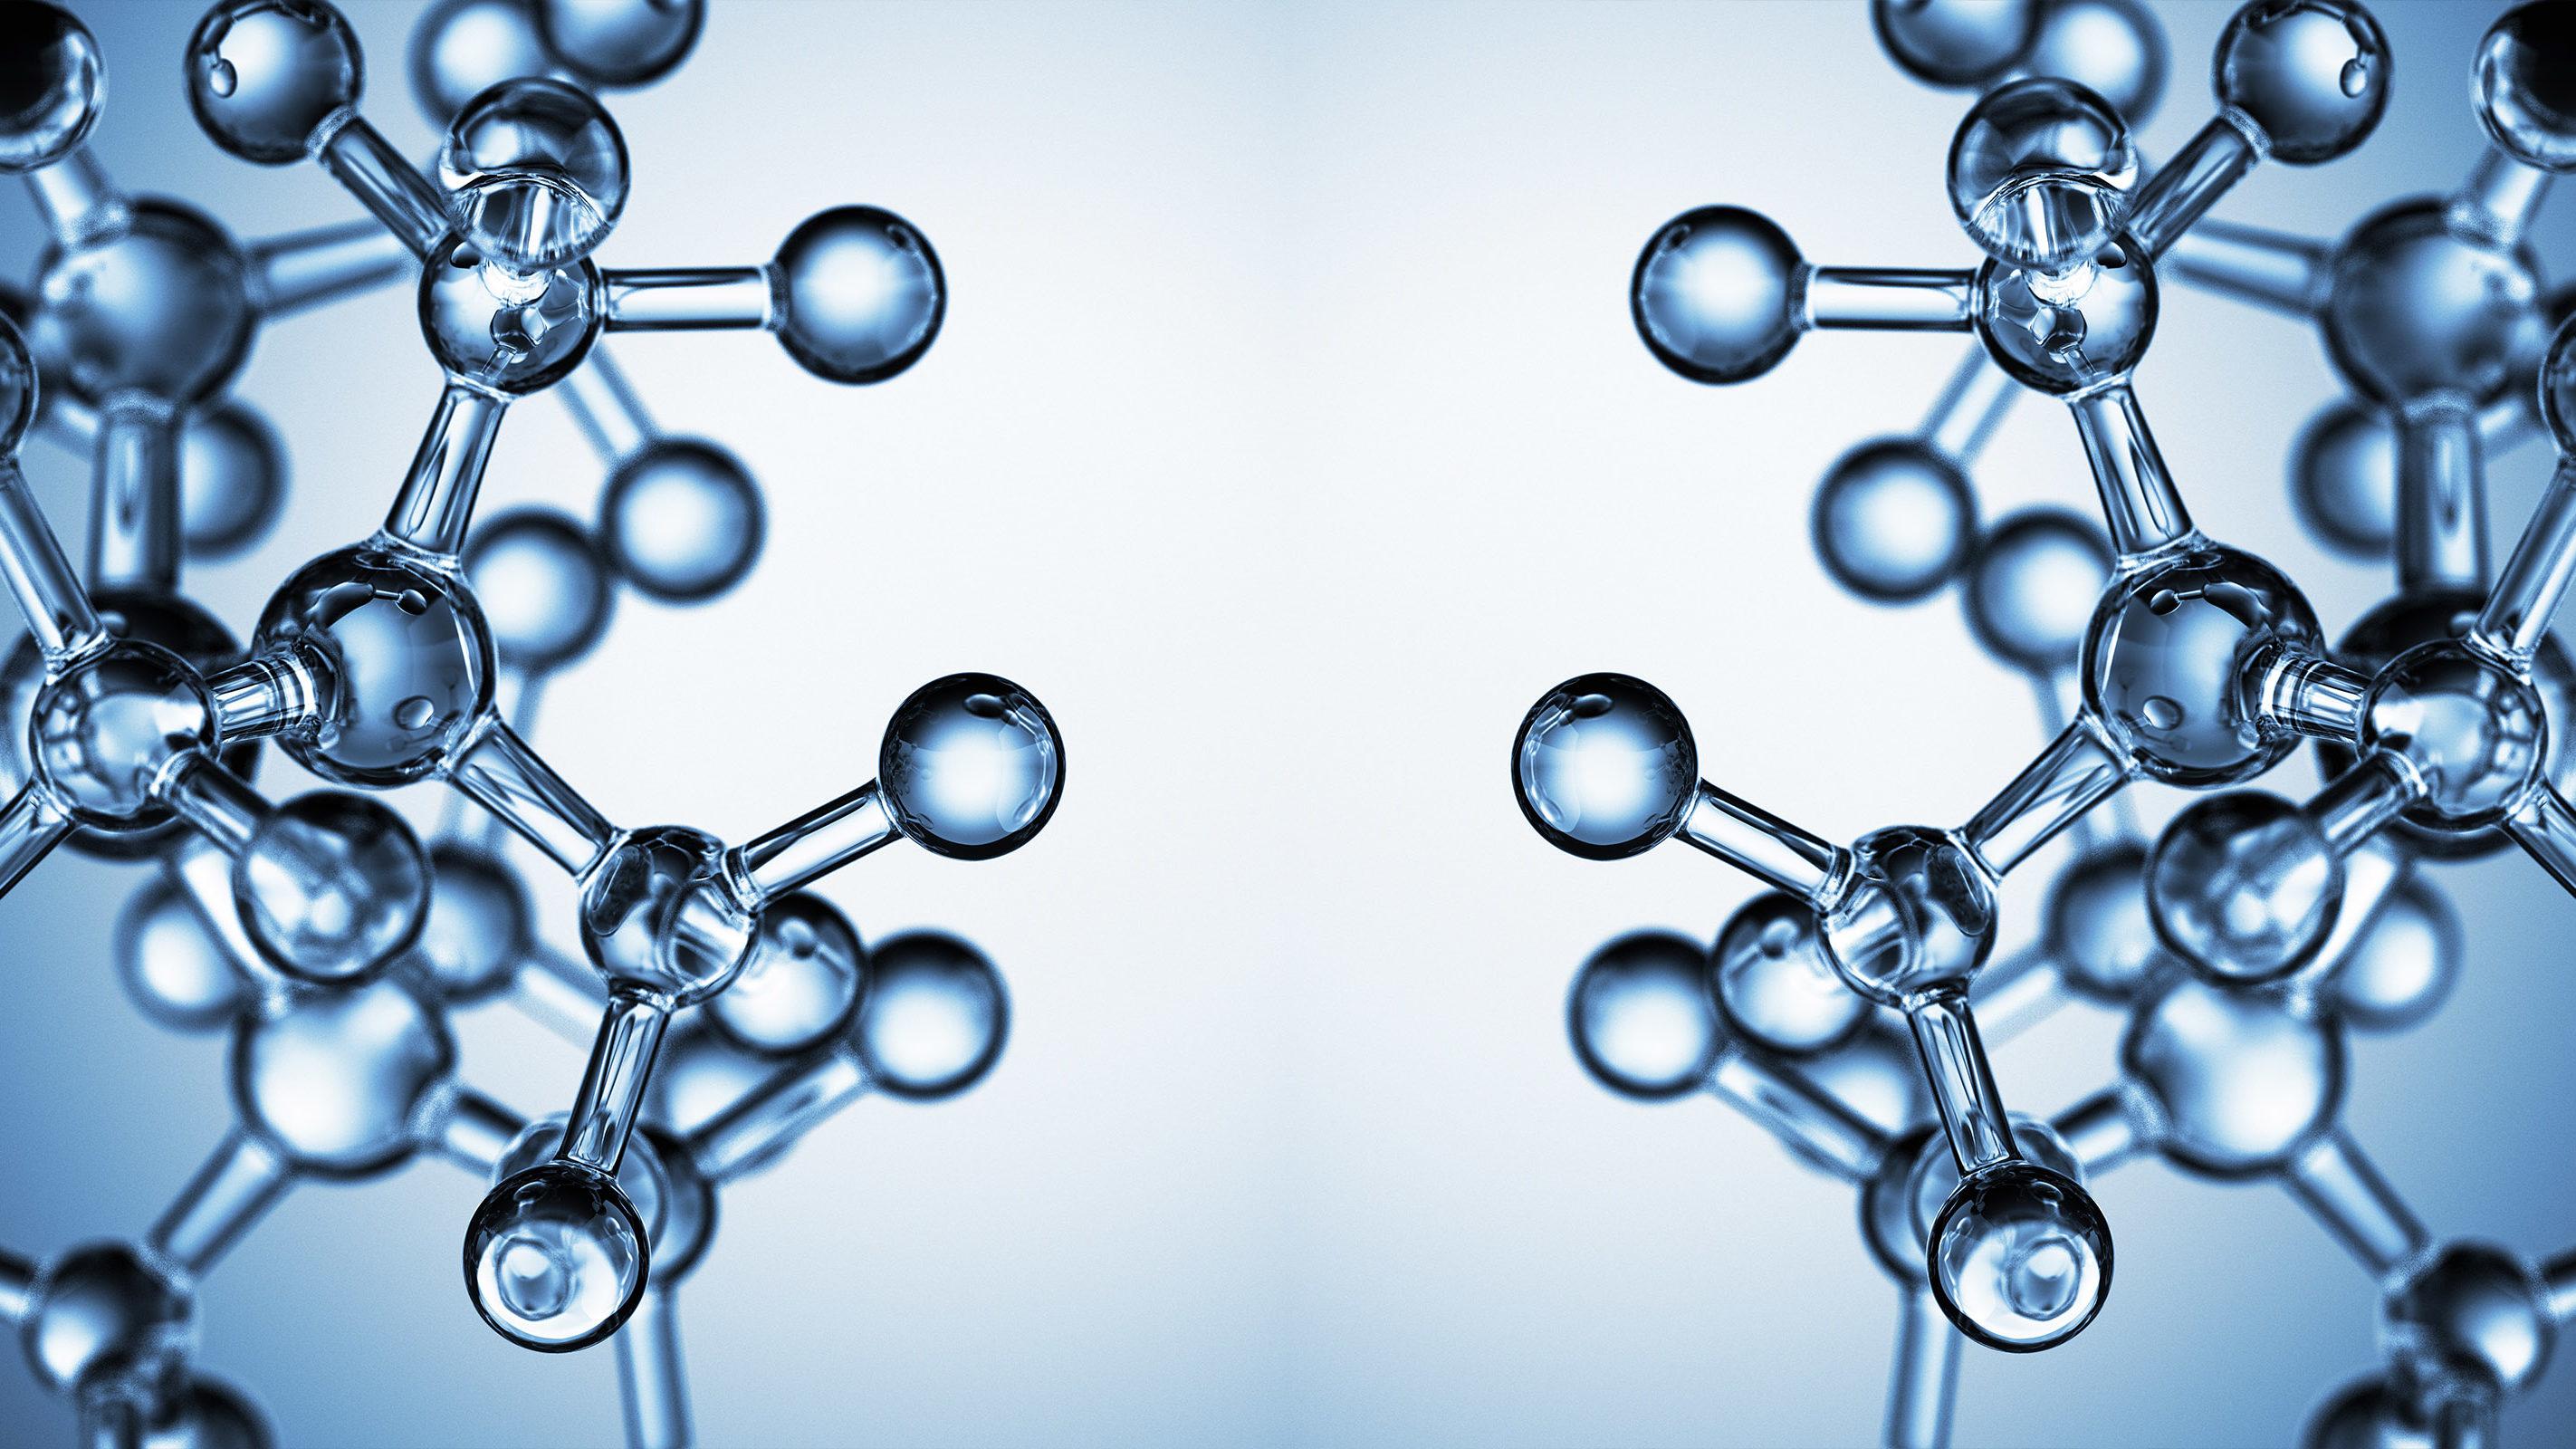 3D render of molecular structures